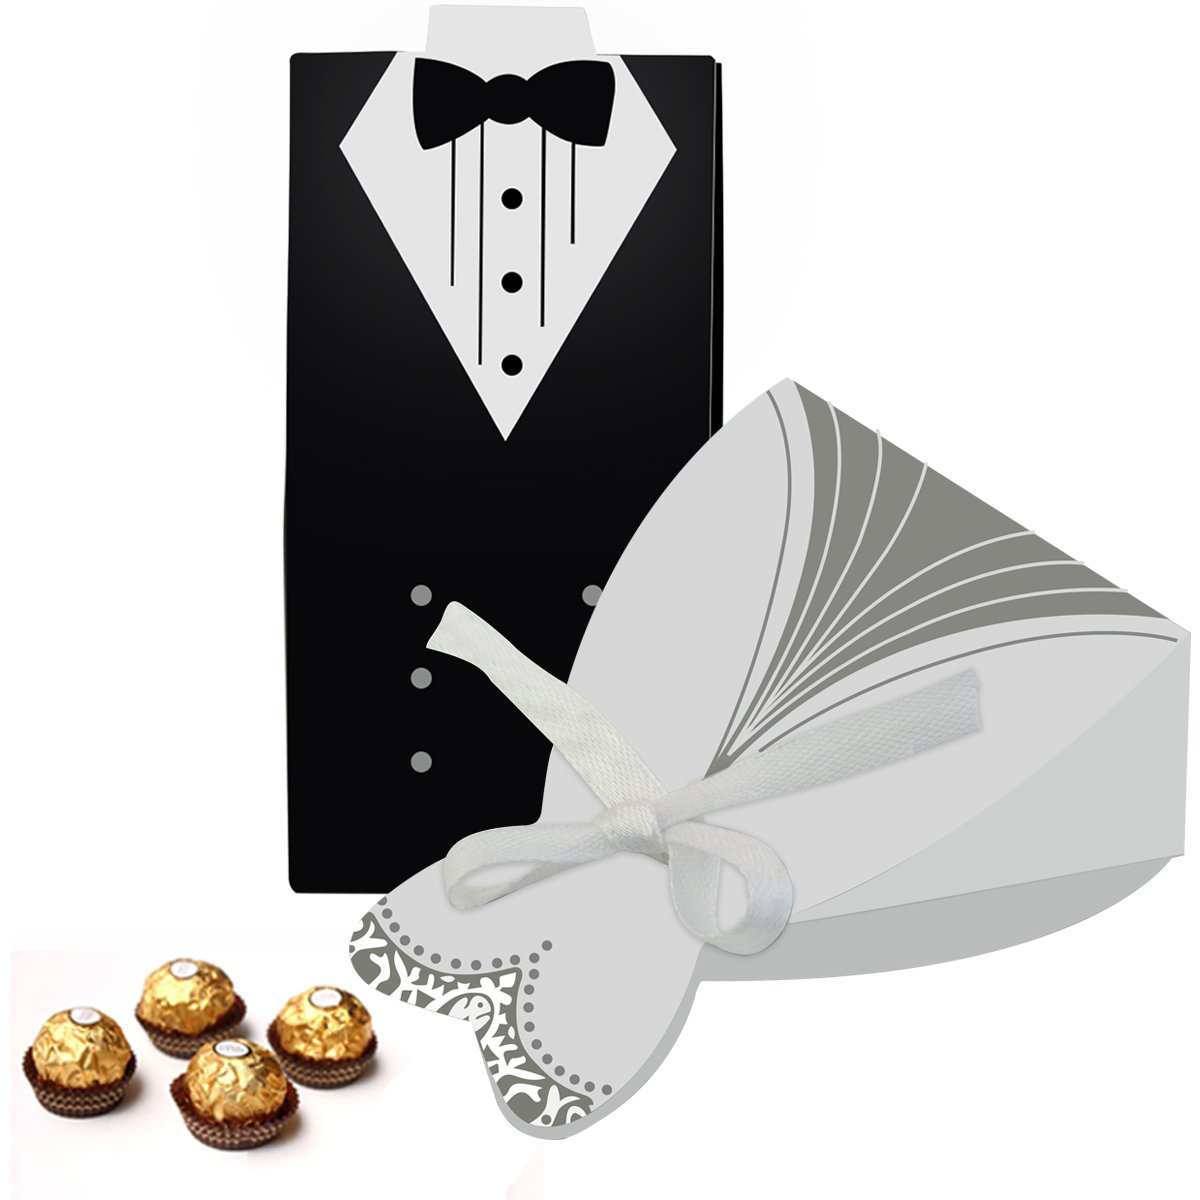 cnomg 100pcs Party Wedding Favor Dress Tuxedo Bride and Wholesale ...